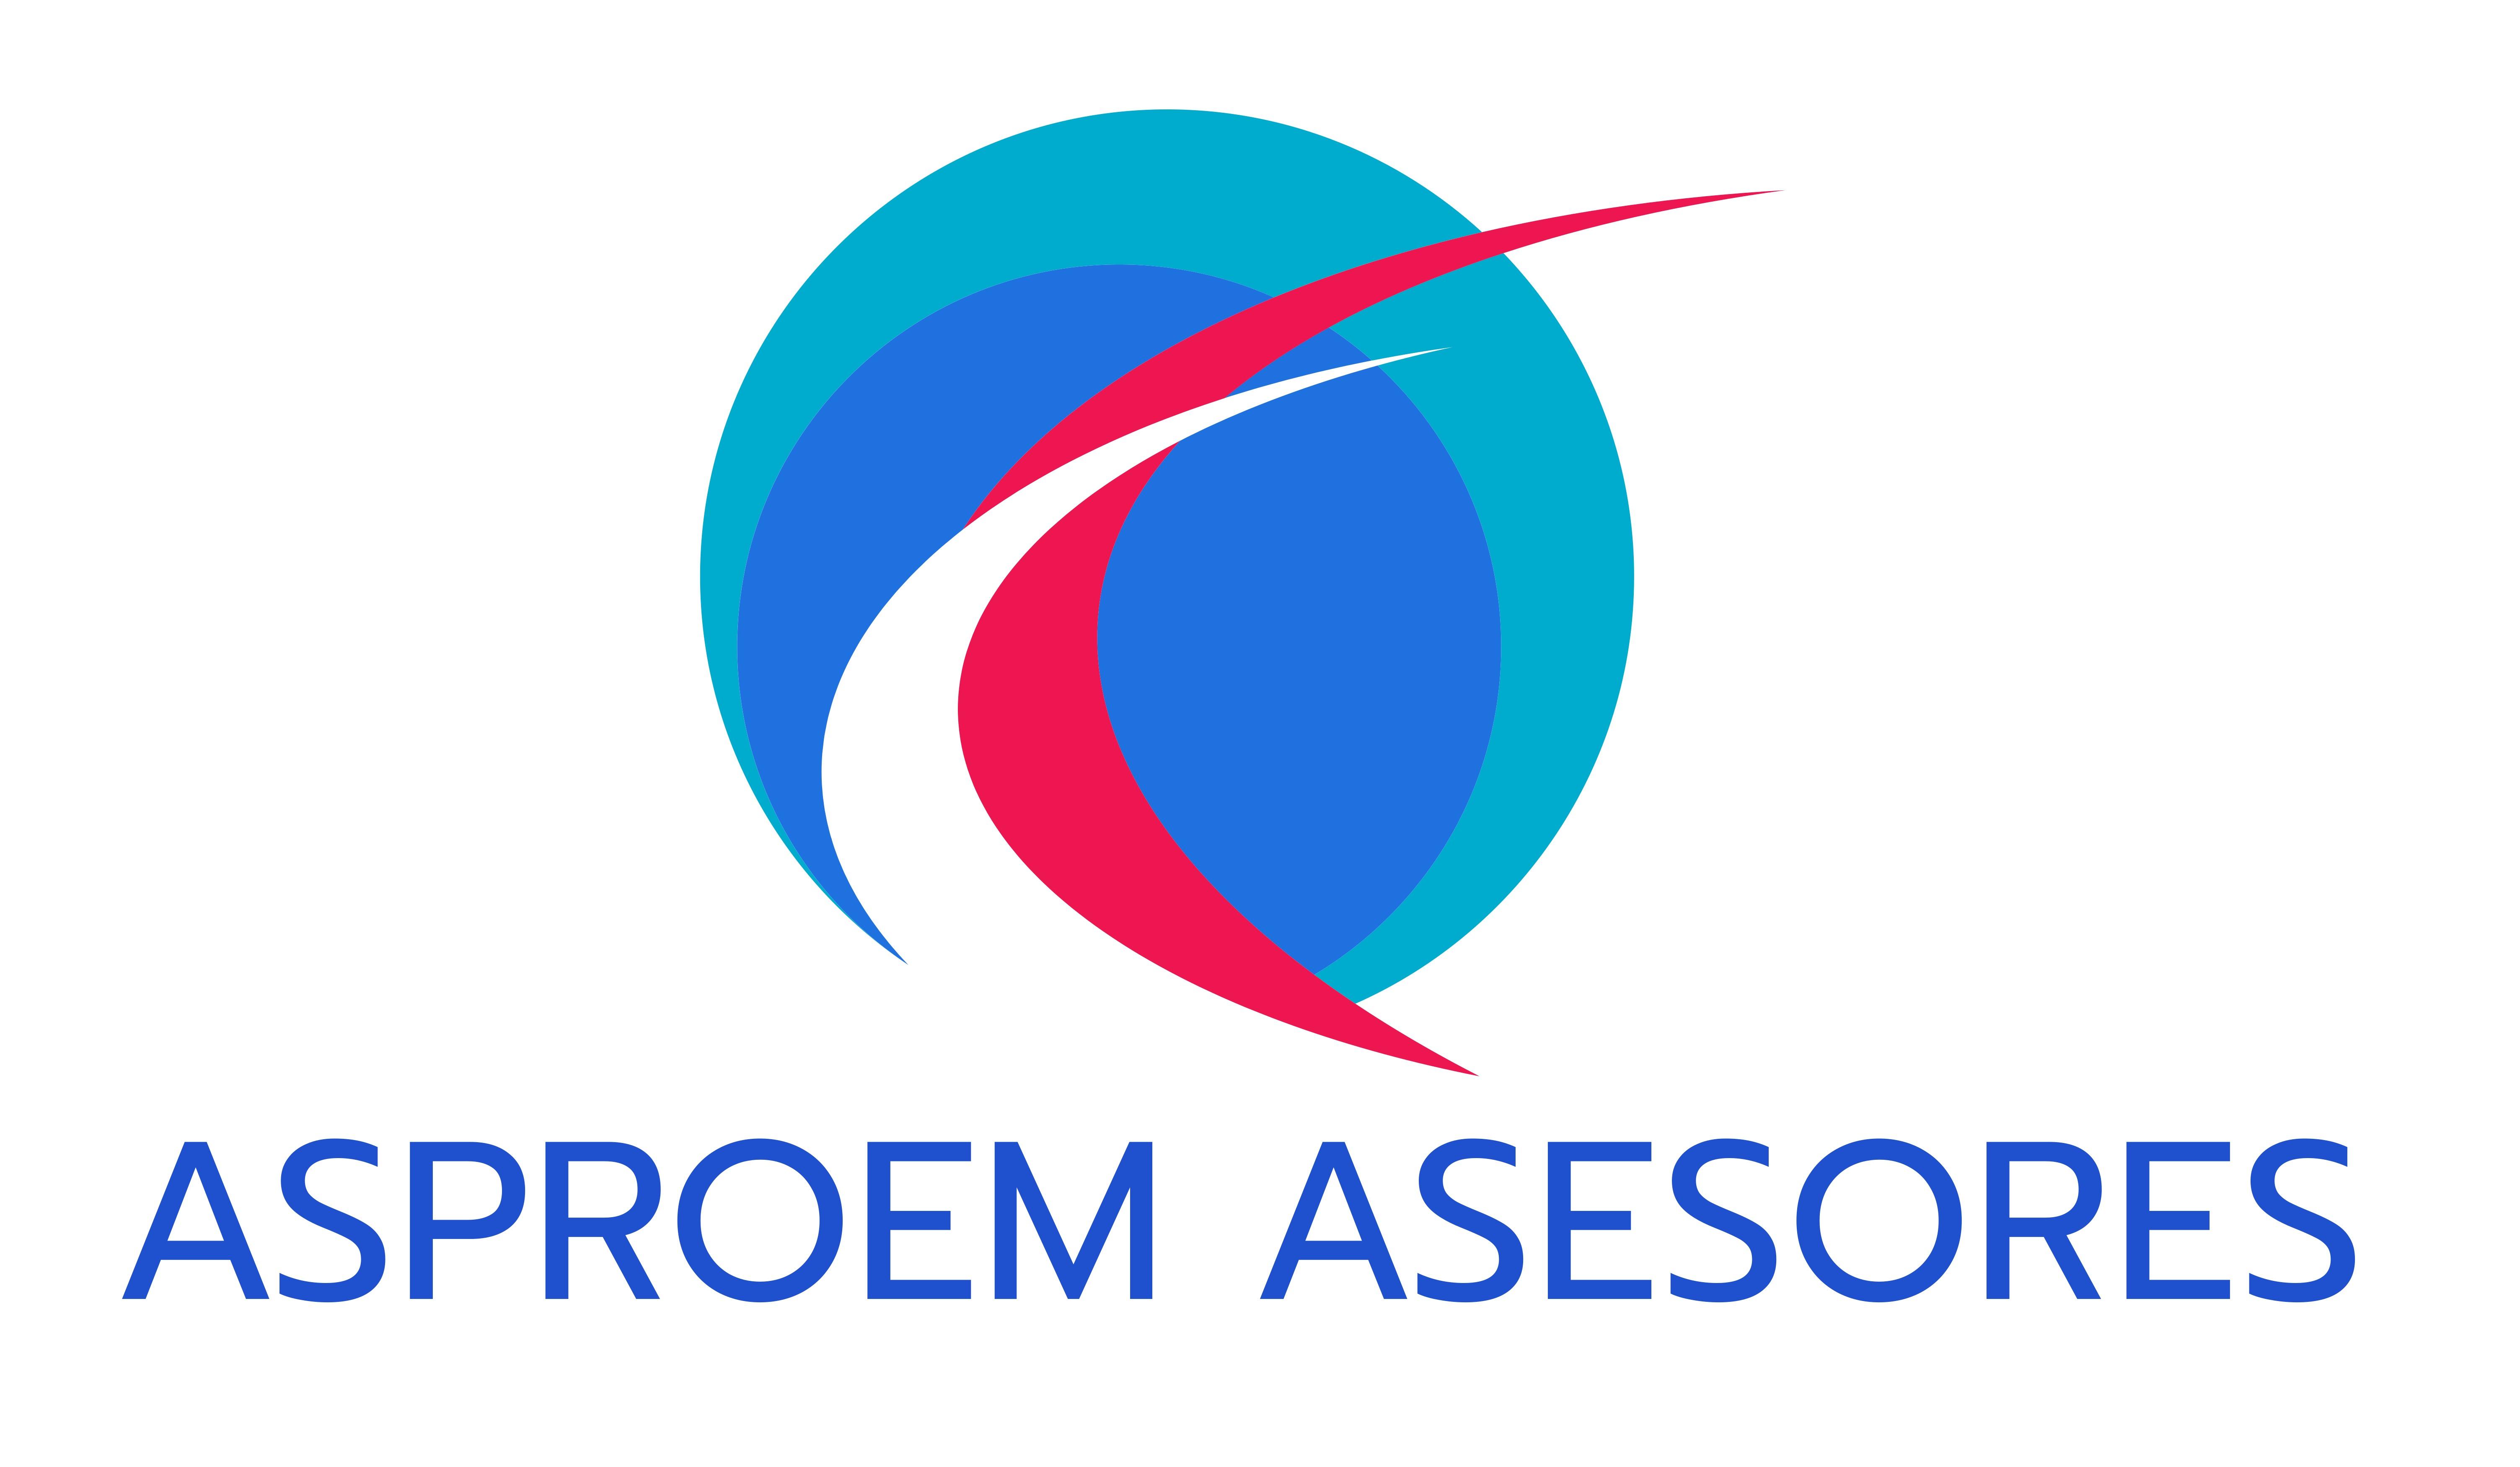 ASPROEM ASESORES